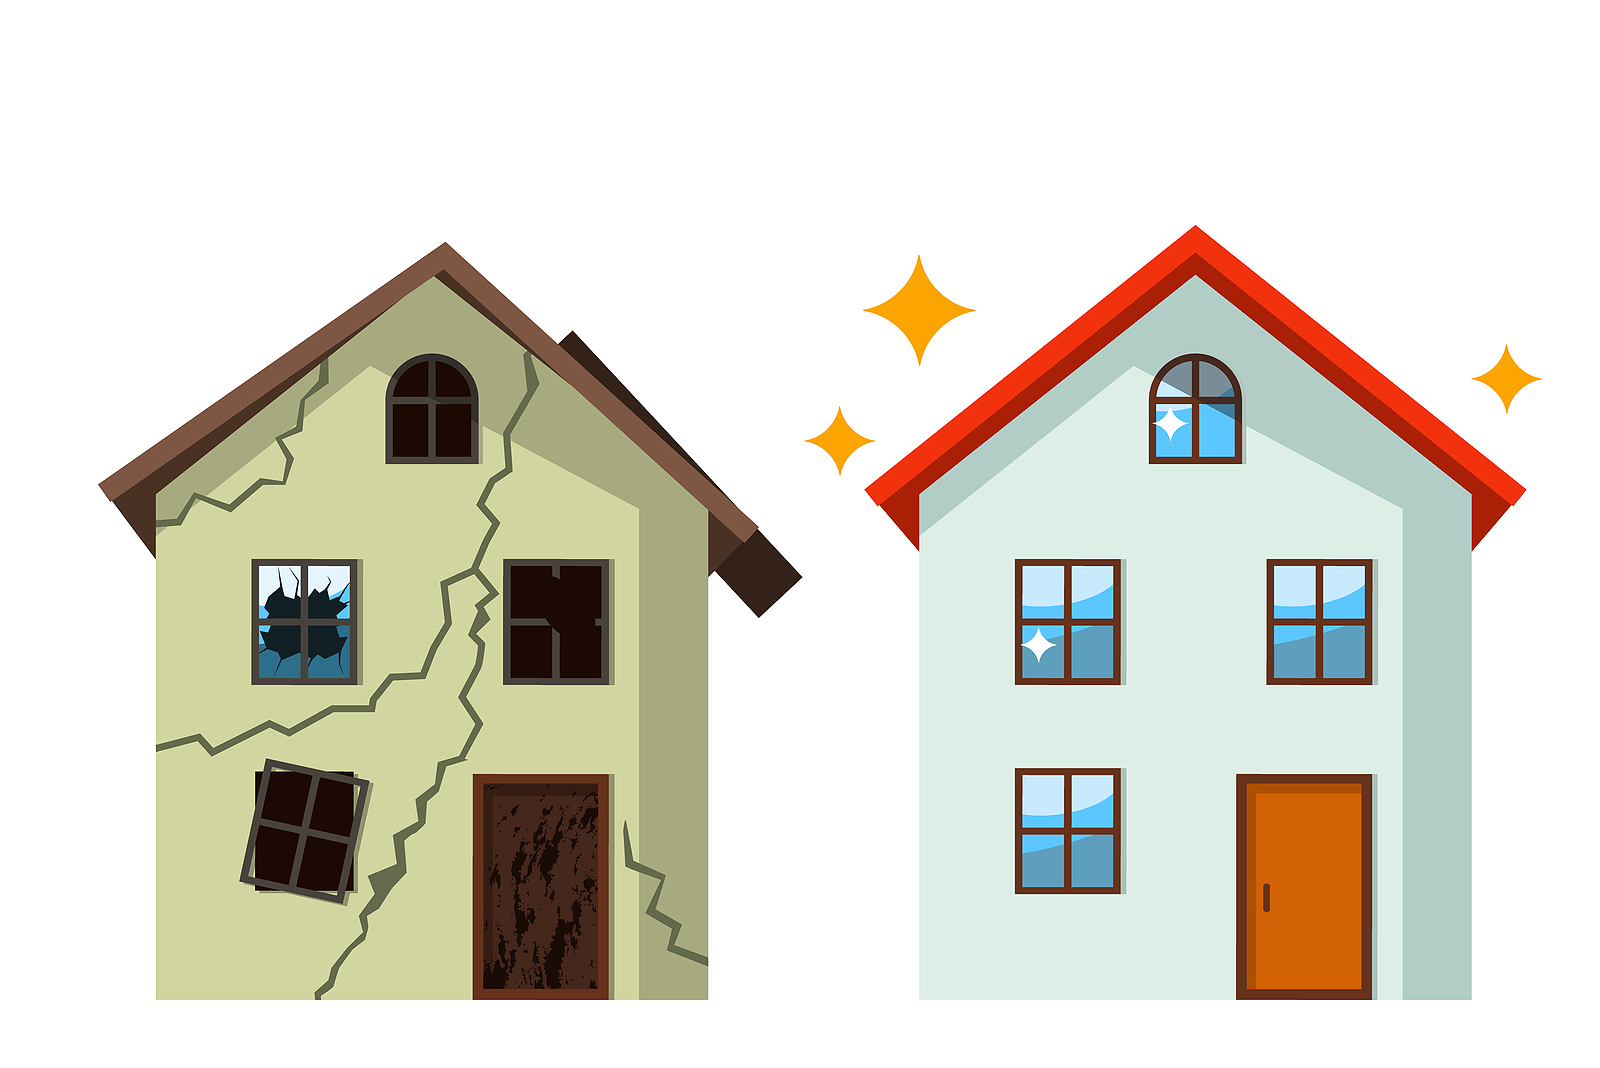 Old-Ruined-House-In-Cracks-renaissance-development-dc